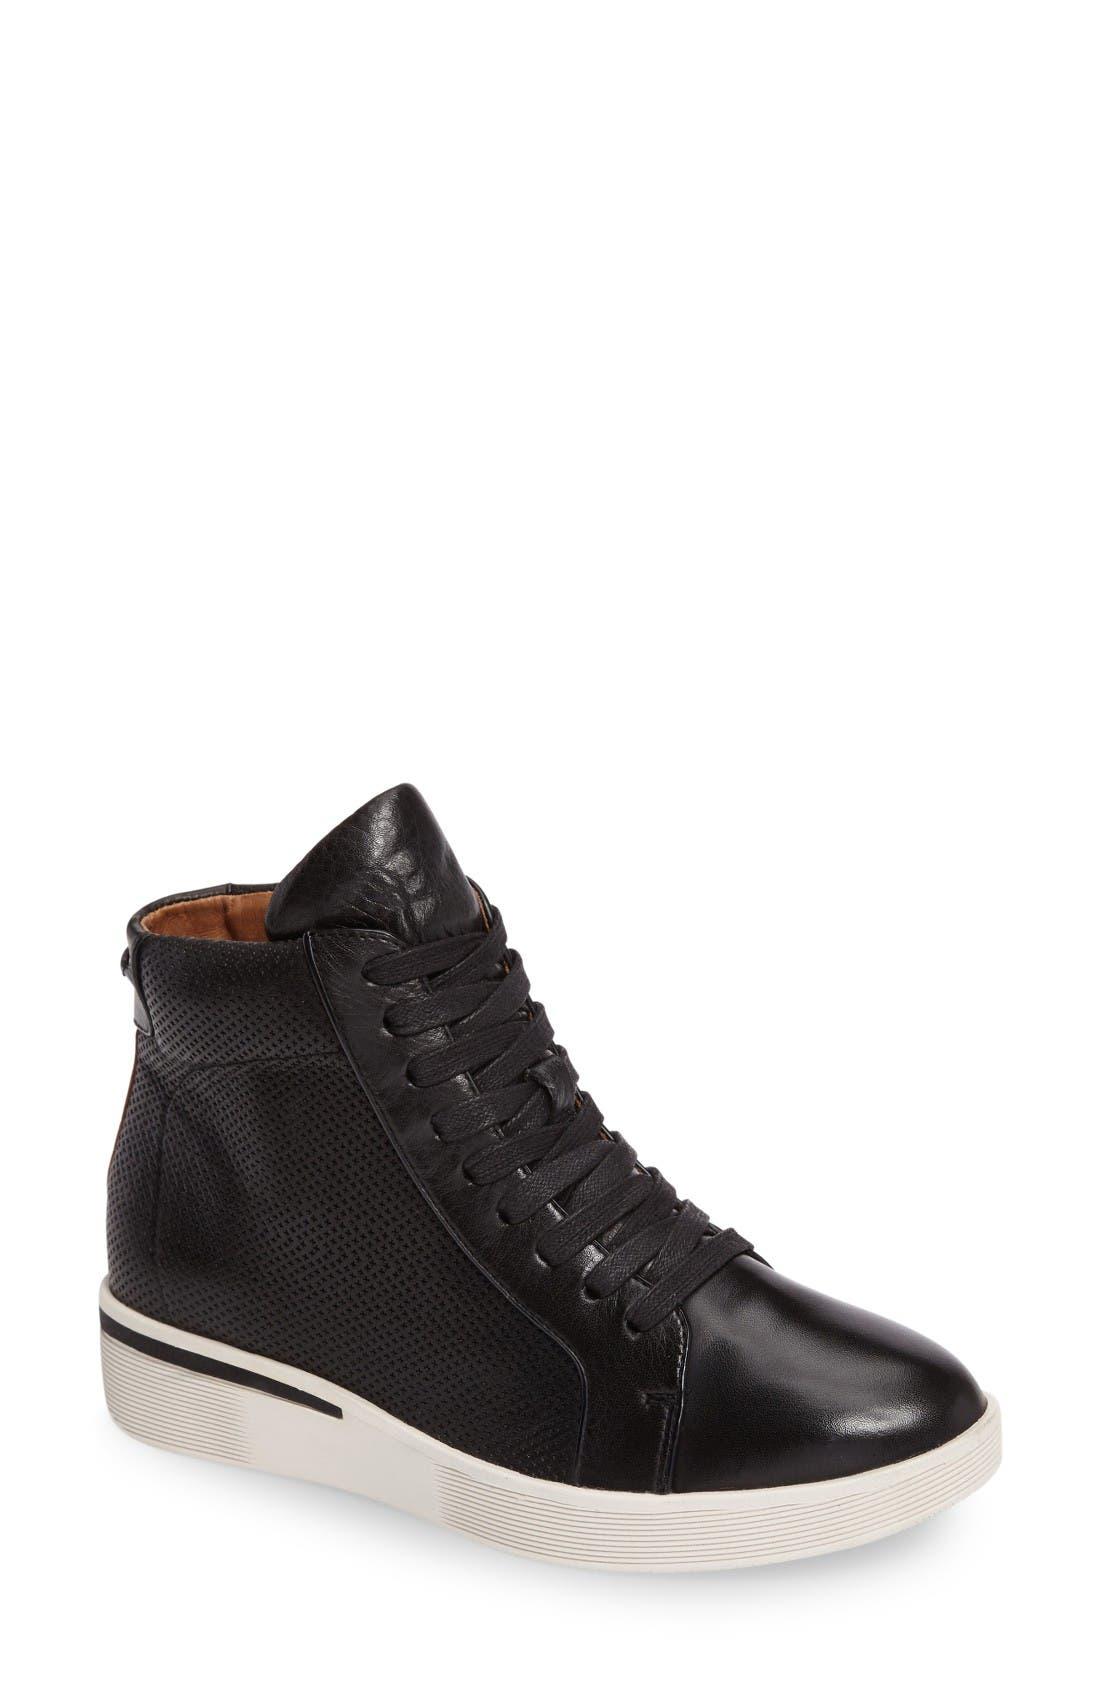 Helka High Top Sneaker,                         Main,                         color, Black Leather